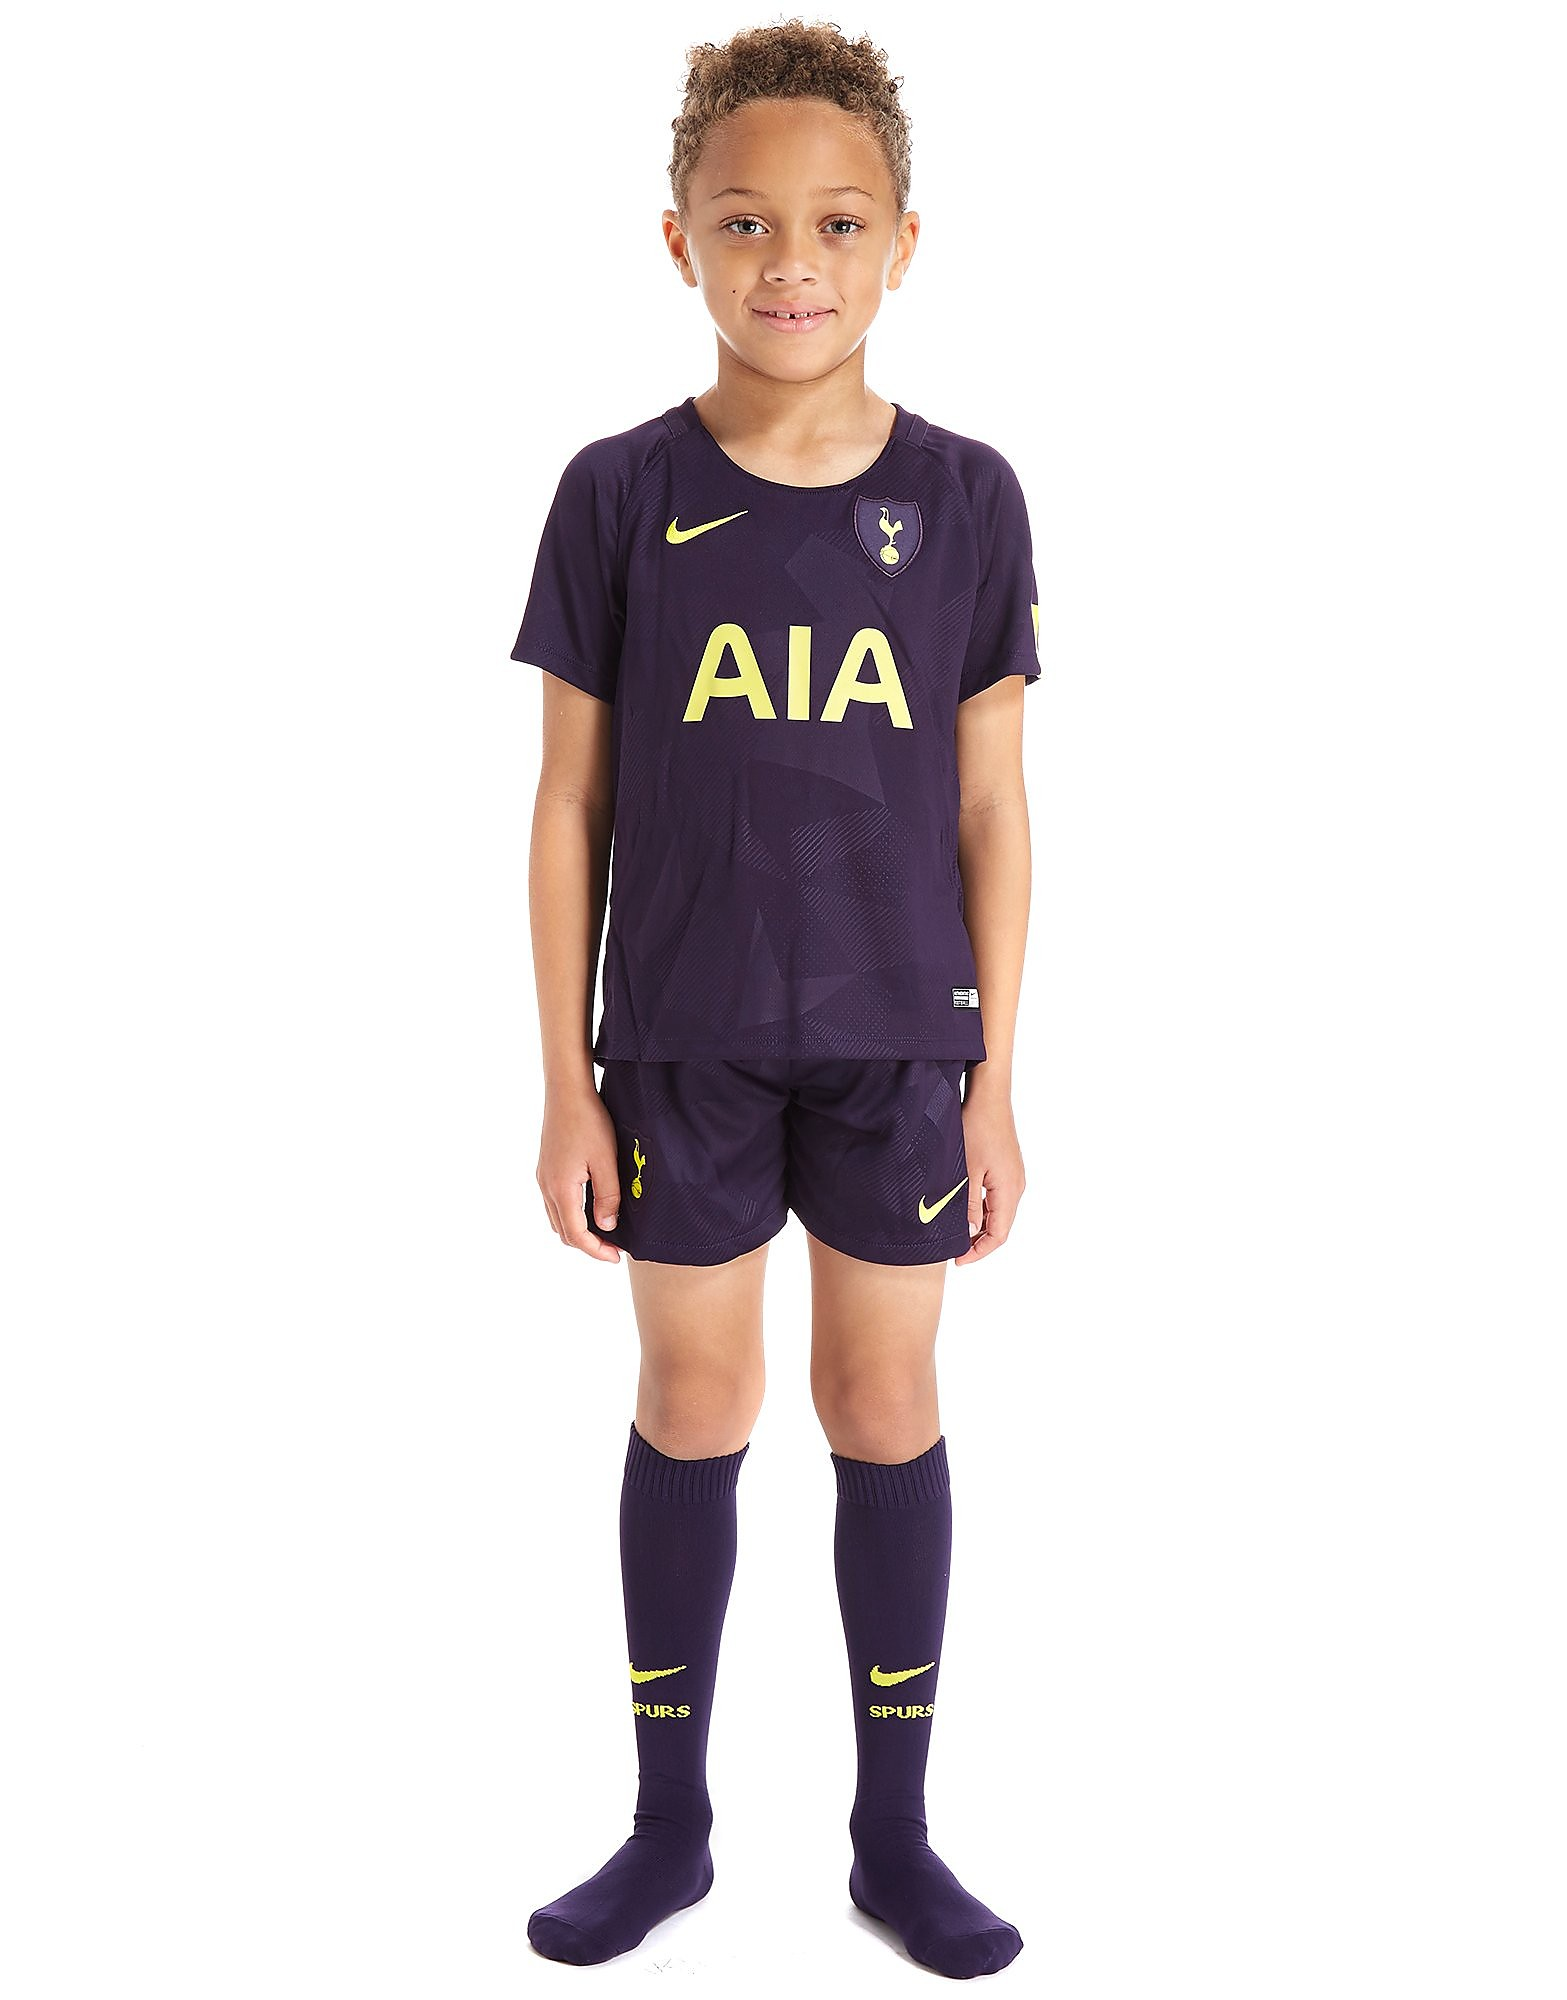 Nike Tottenham Hotspur 2017/18 Third Kit Children PRE